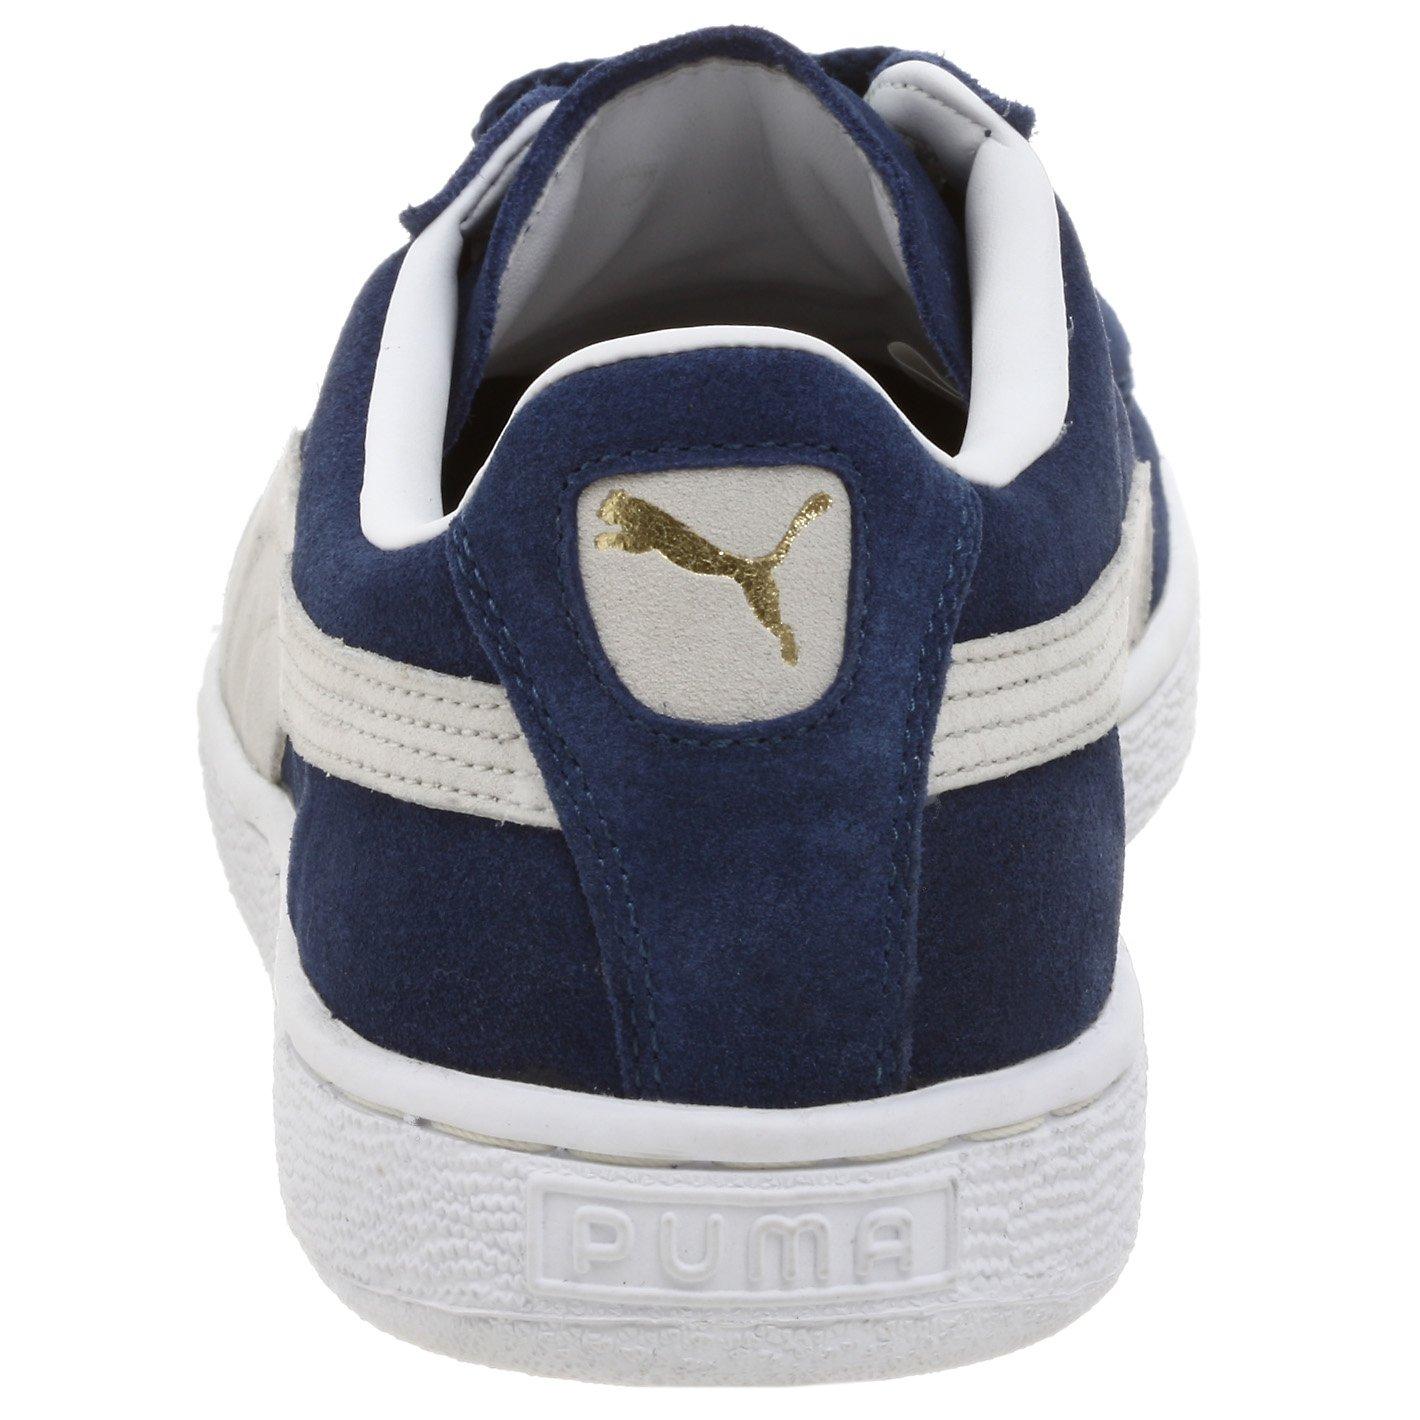 PUMA Suede Classic Sneaker,Blue/White,8 M US Men's by PUMA (Image #2)